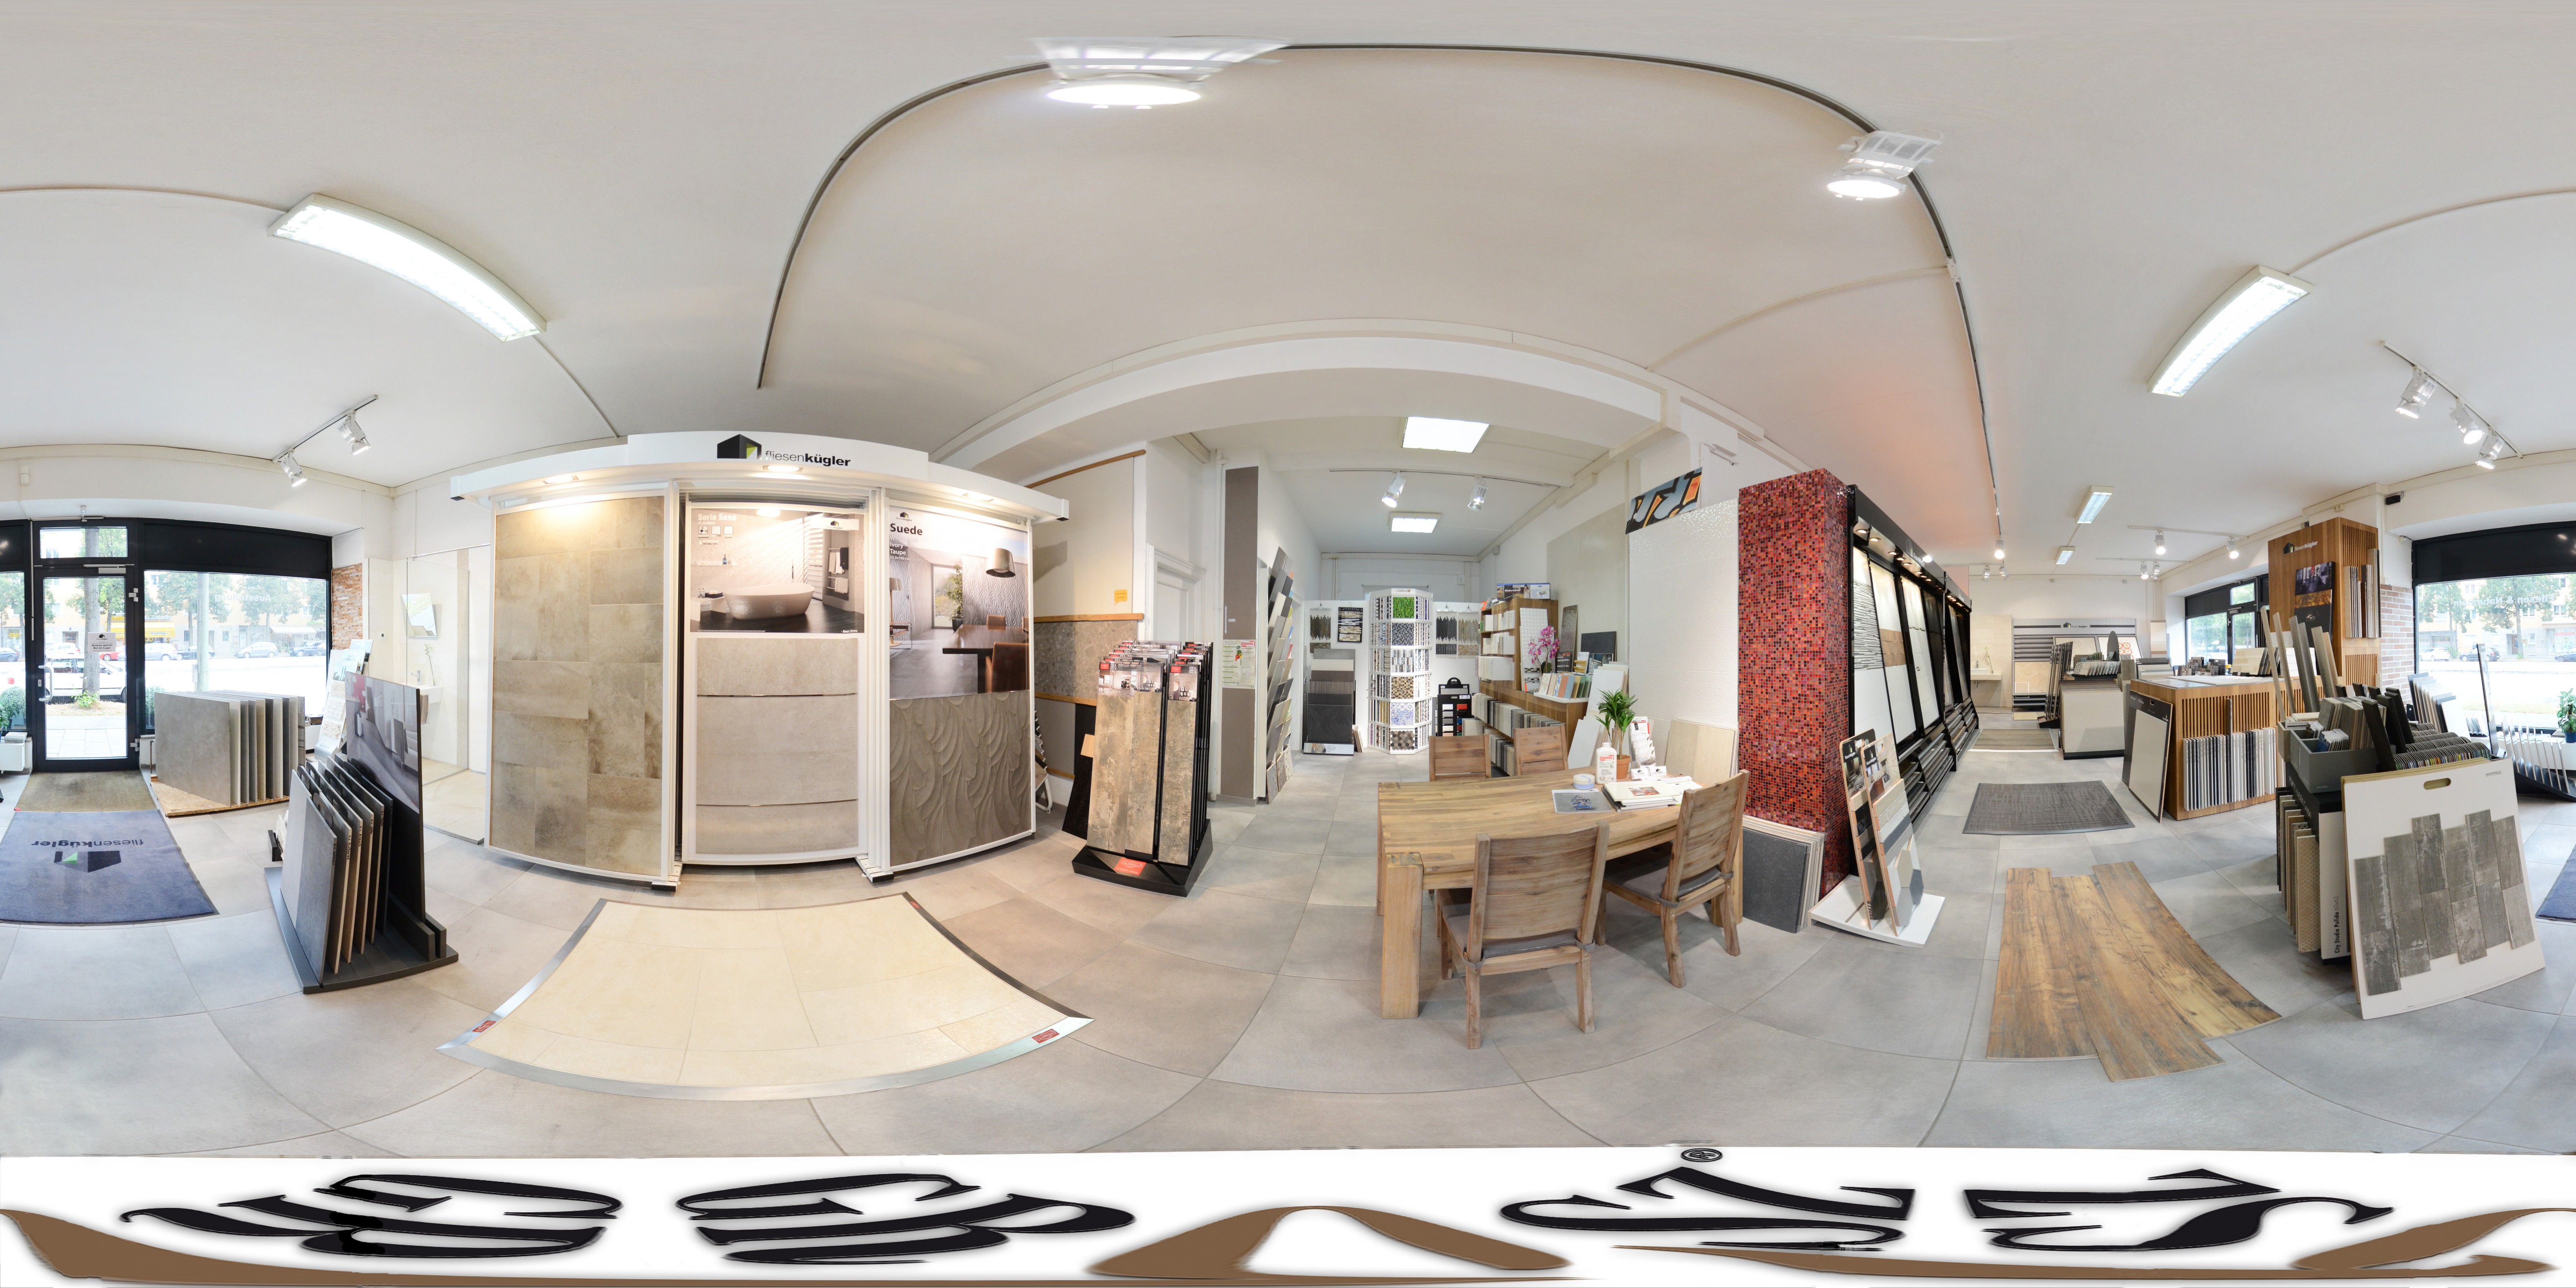 fliesenk gler gmbh in m nchen fliesenleger plattenleger fliesenhandel gesch fte handel. Black Bedroom Furniture Sets. Home Design Ideas